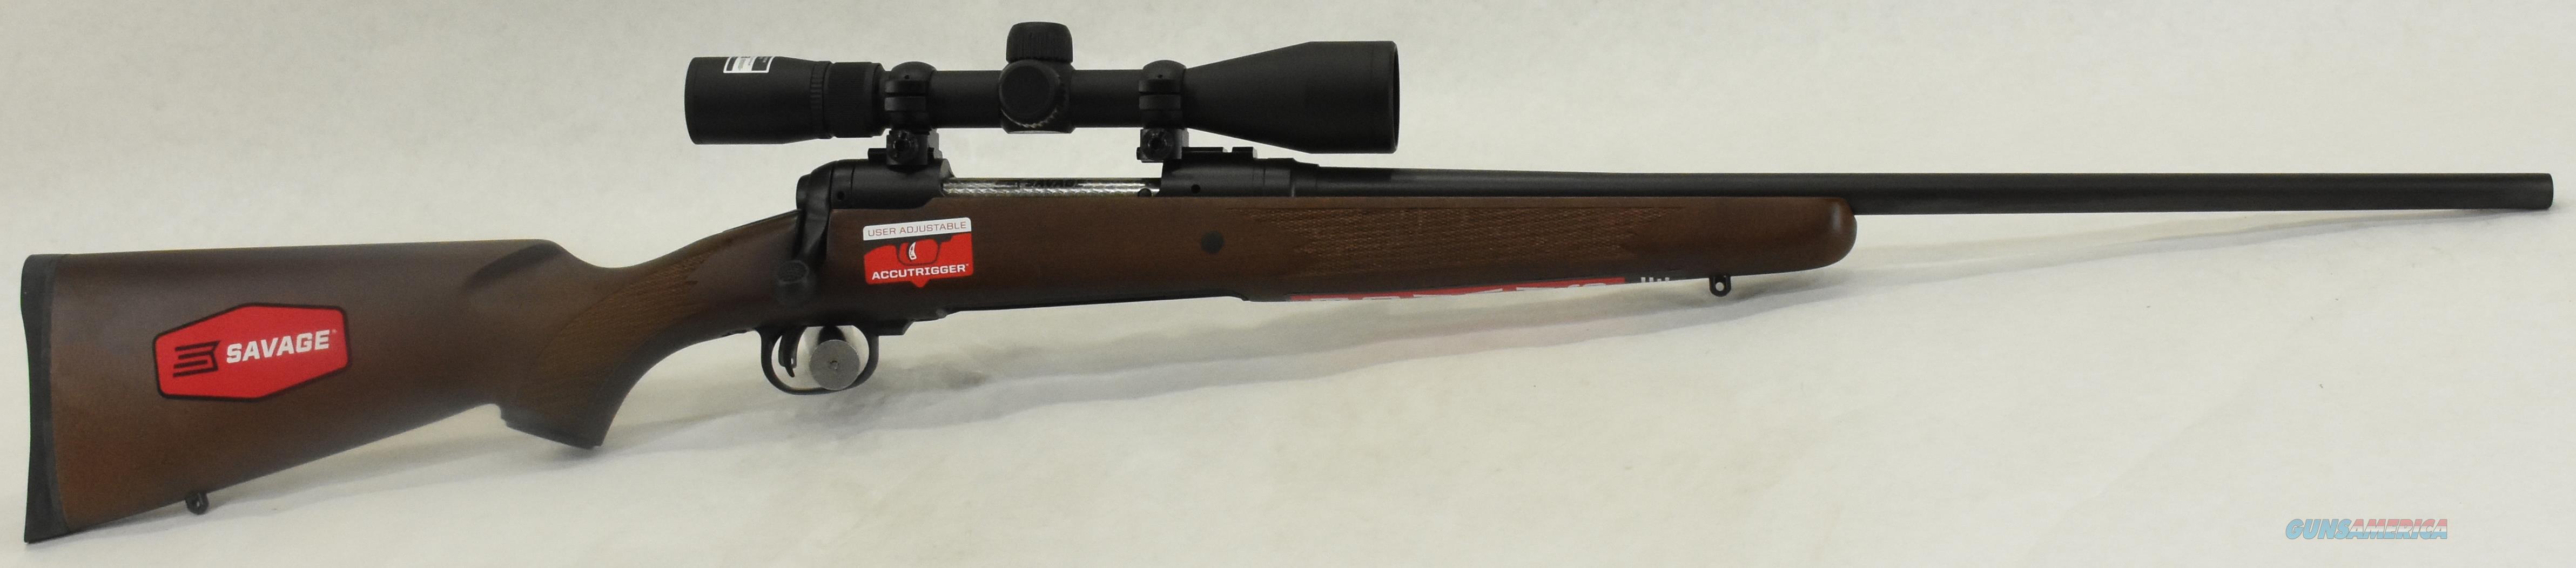 110 Trophy Hunter Walnut XP 30-06 22In  19719  Guns > Rifles > Savage Rifles > 10/110